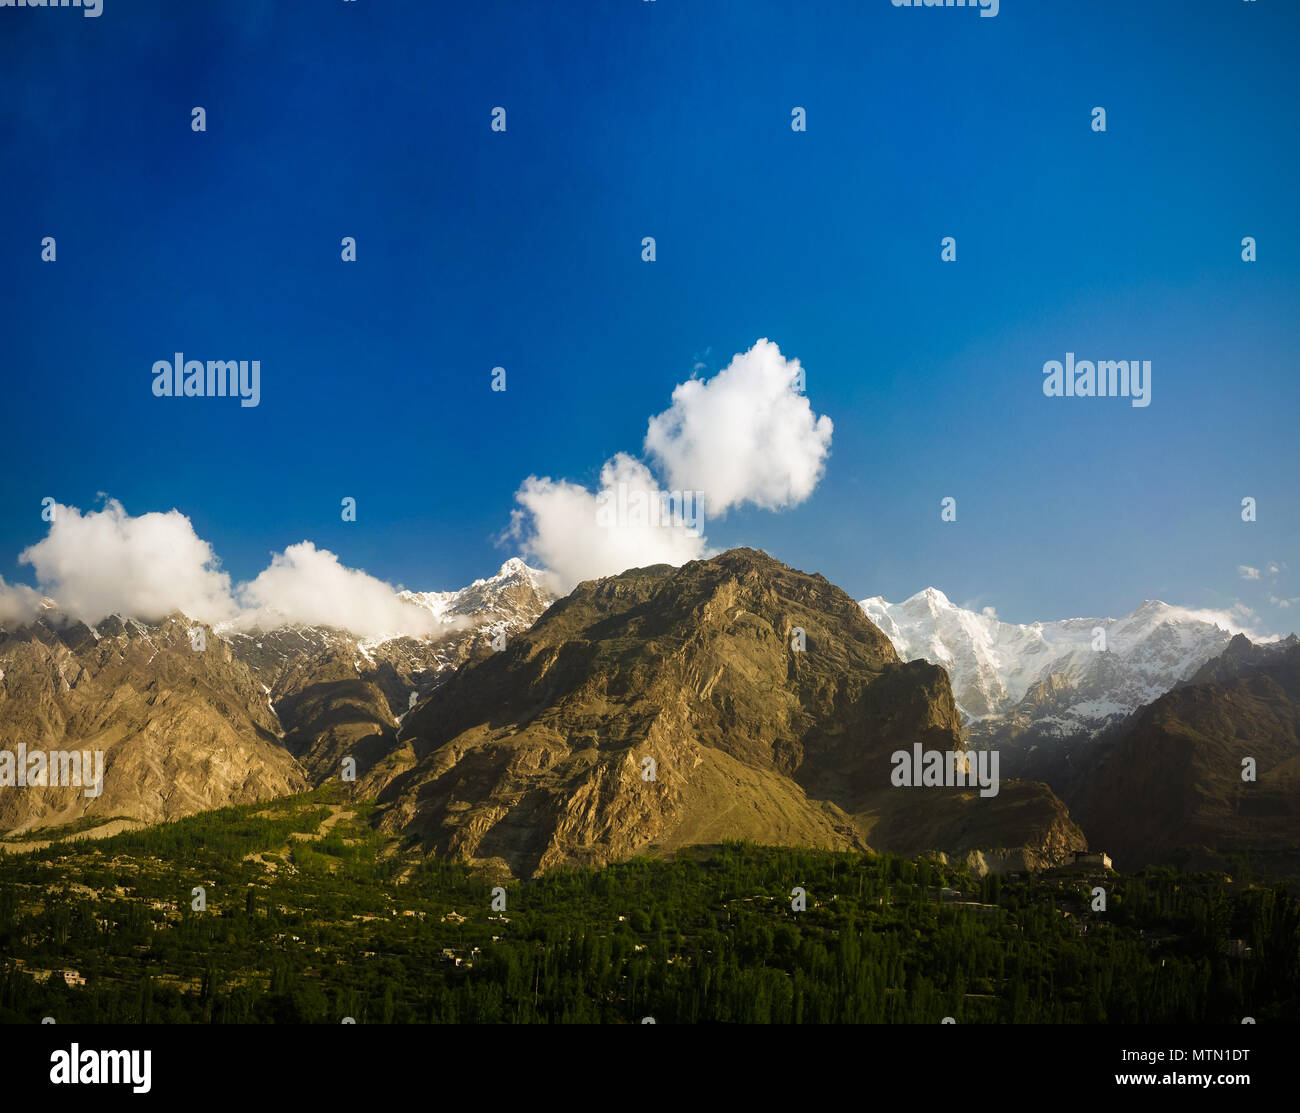 Panorama of Karimabad and Hunza valley Gilgit-Baltistan, Pakistan - Stock Image